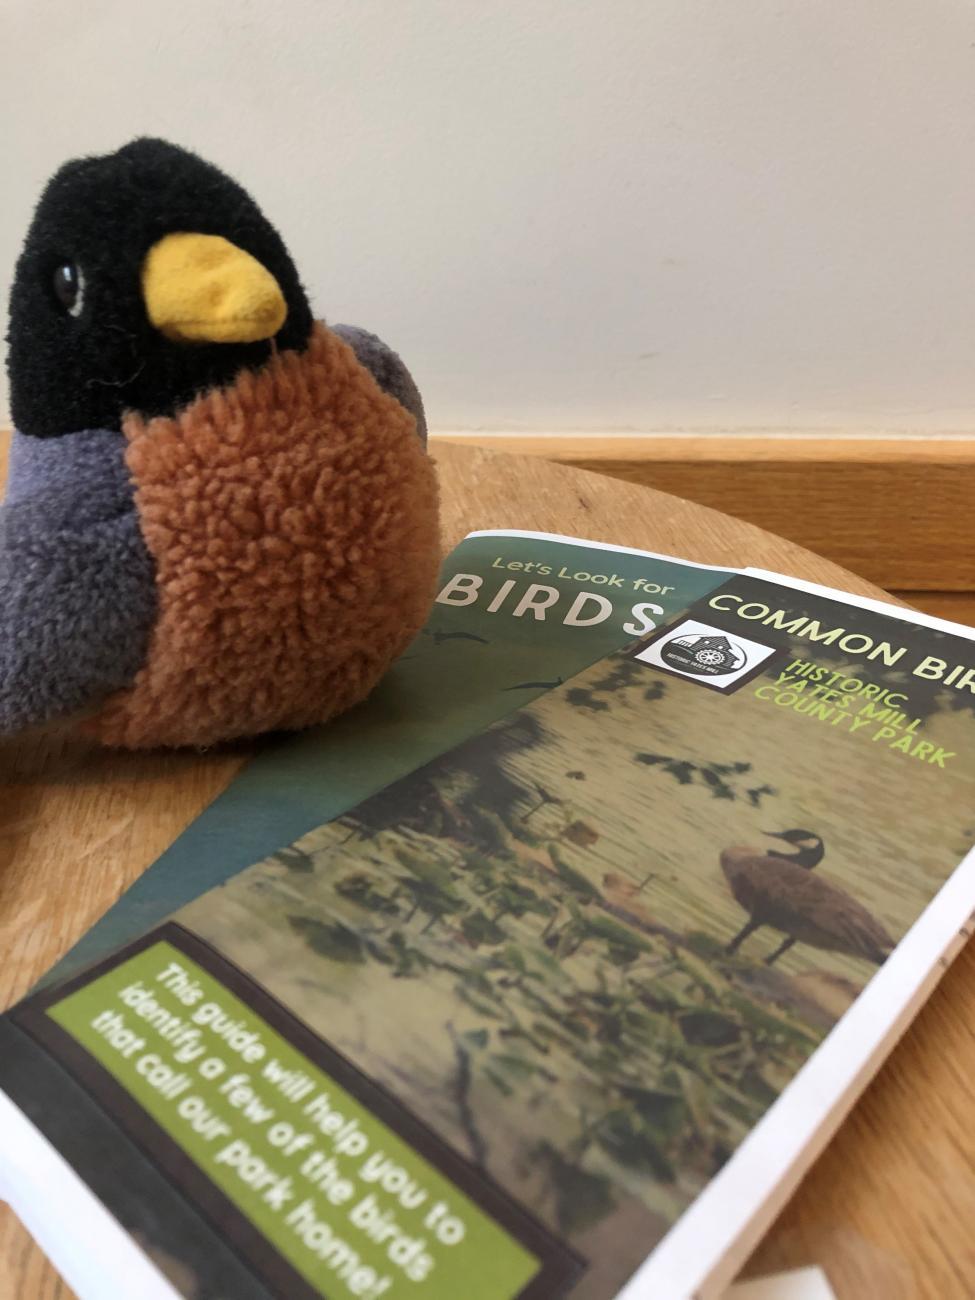 Yates Mill Bird Guides Photo